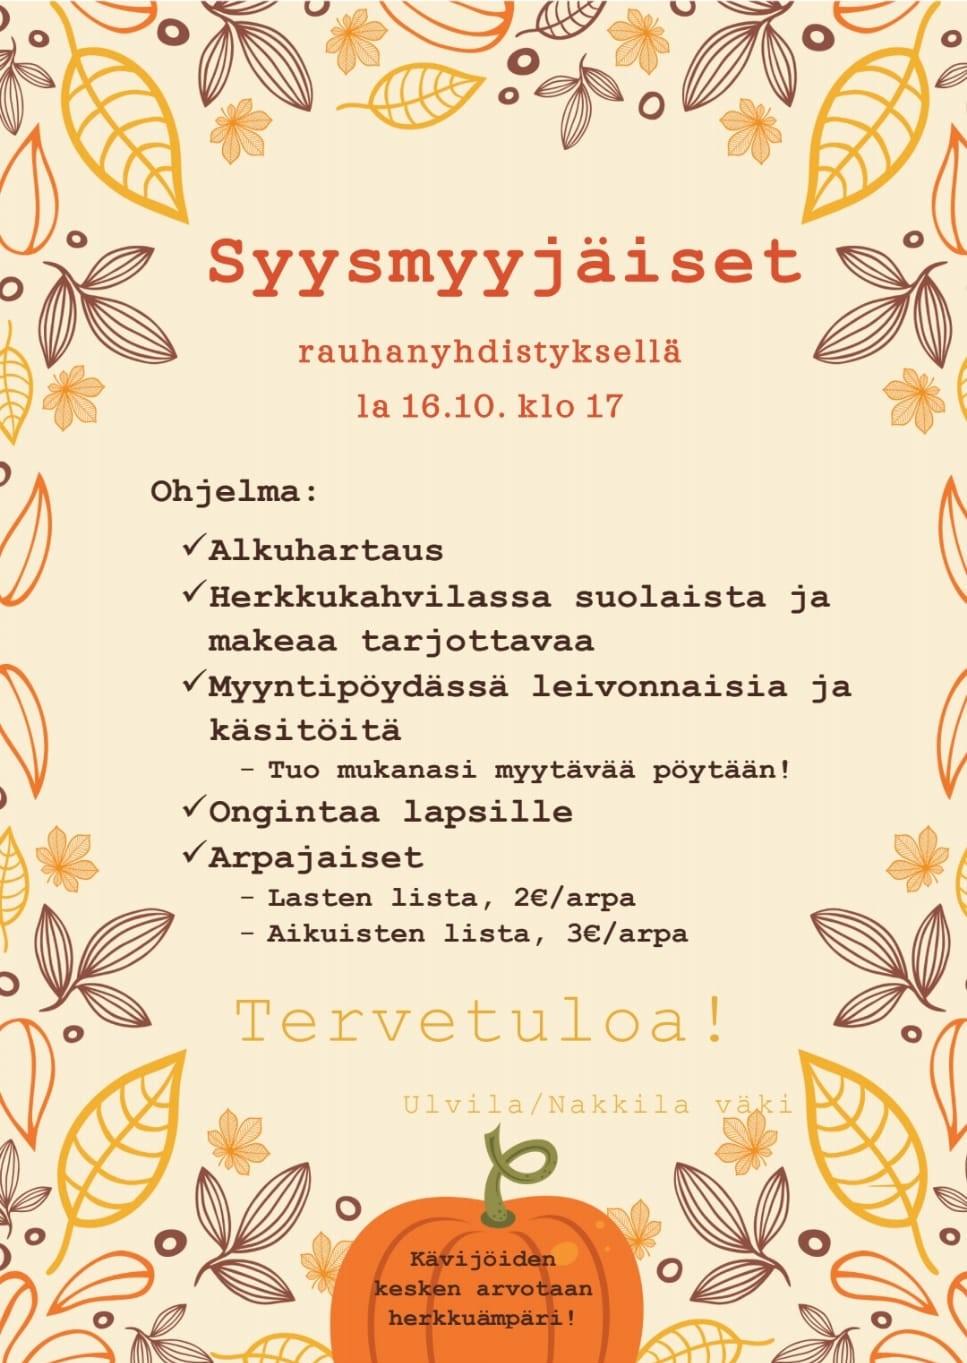 Syysmyyjäiset (Ulvila-Nakkila)